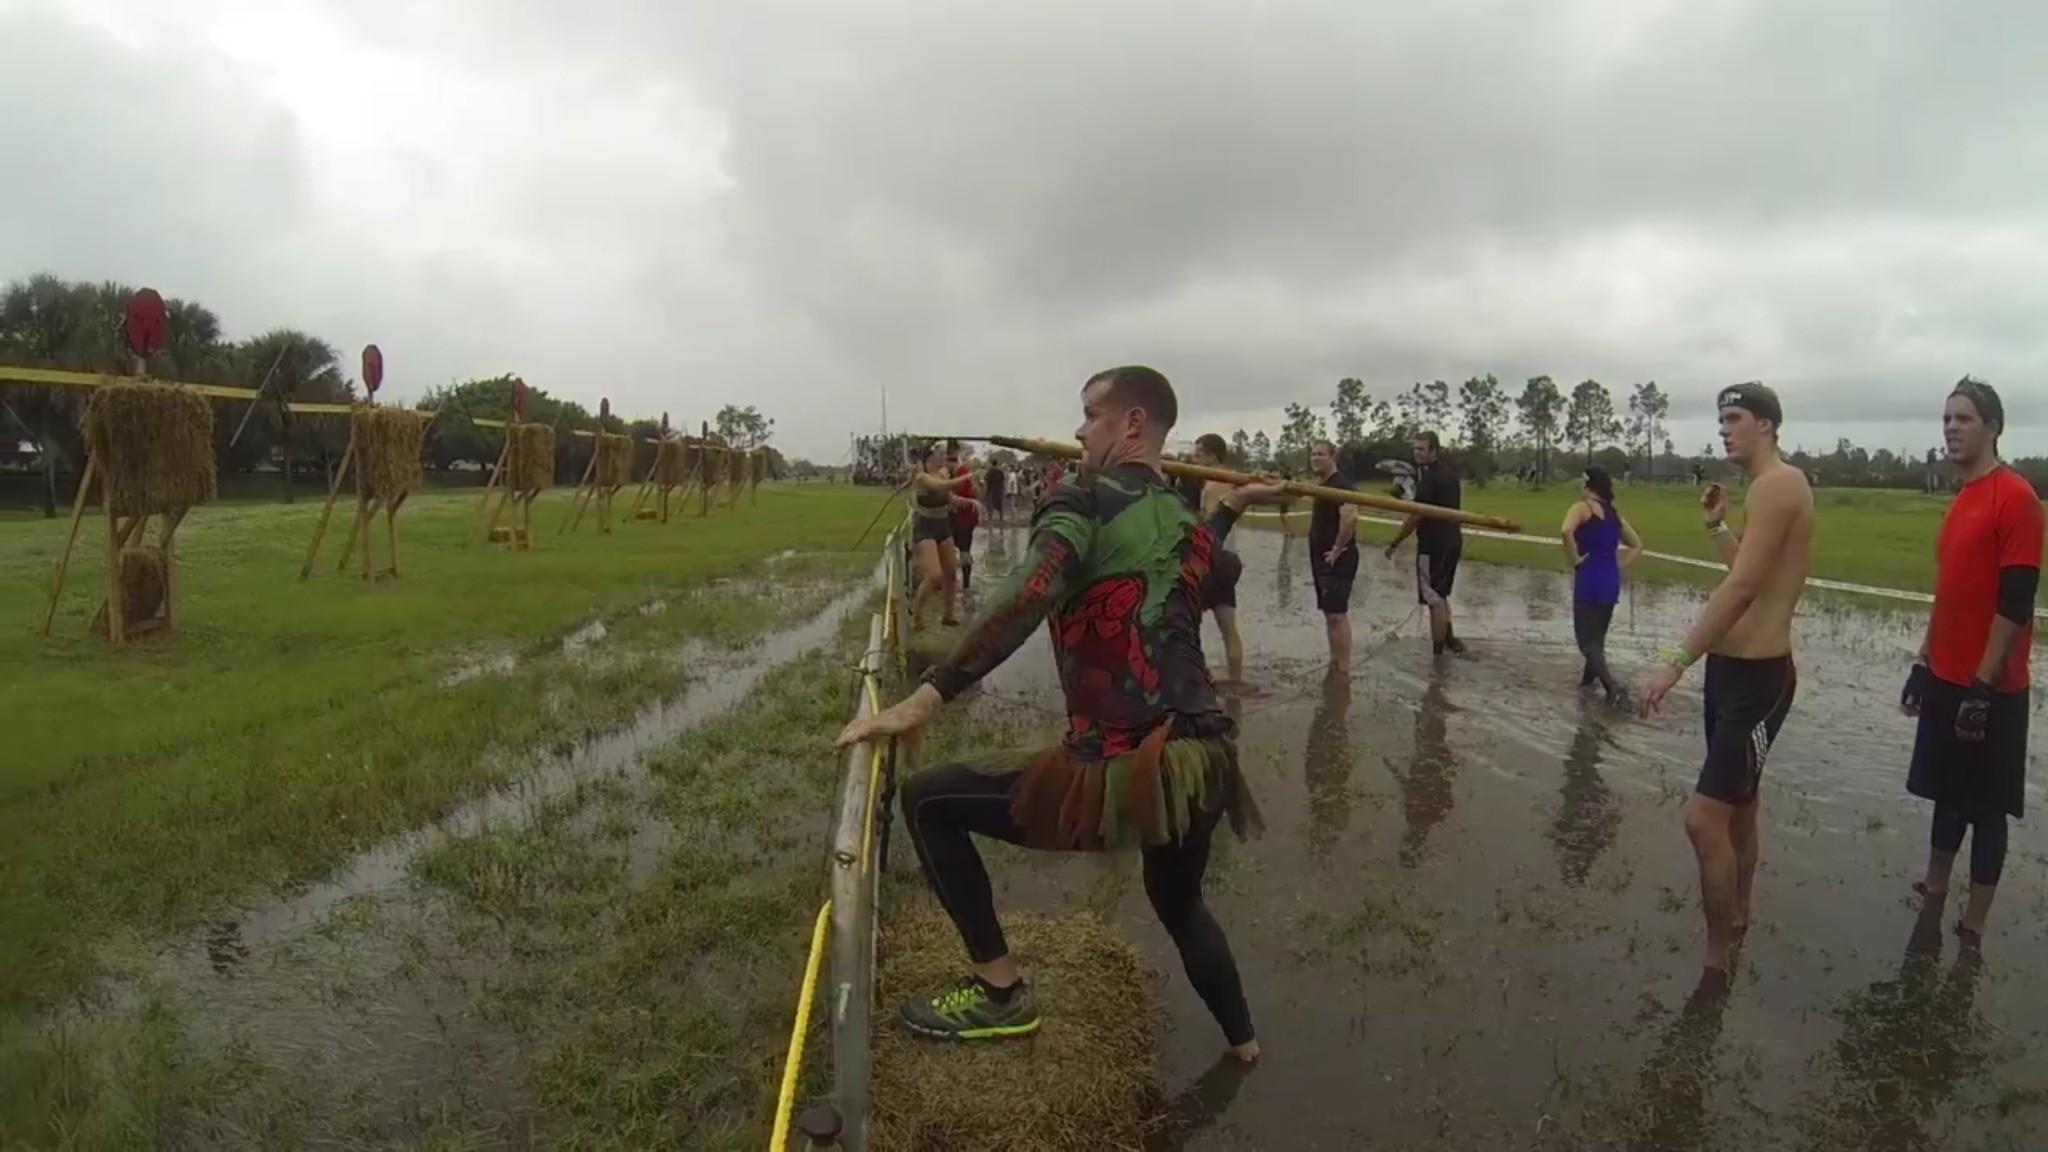 Spartan Race Miami 12052015 – Spear Throw – Courtesy of Arnel Banawa